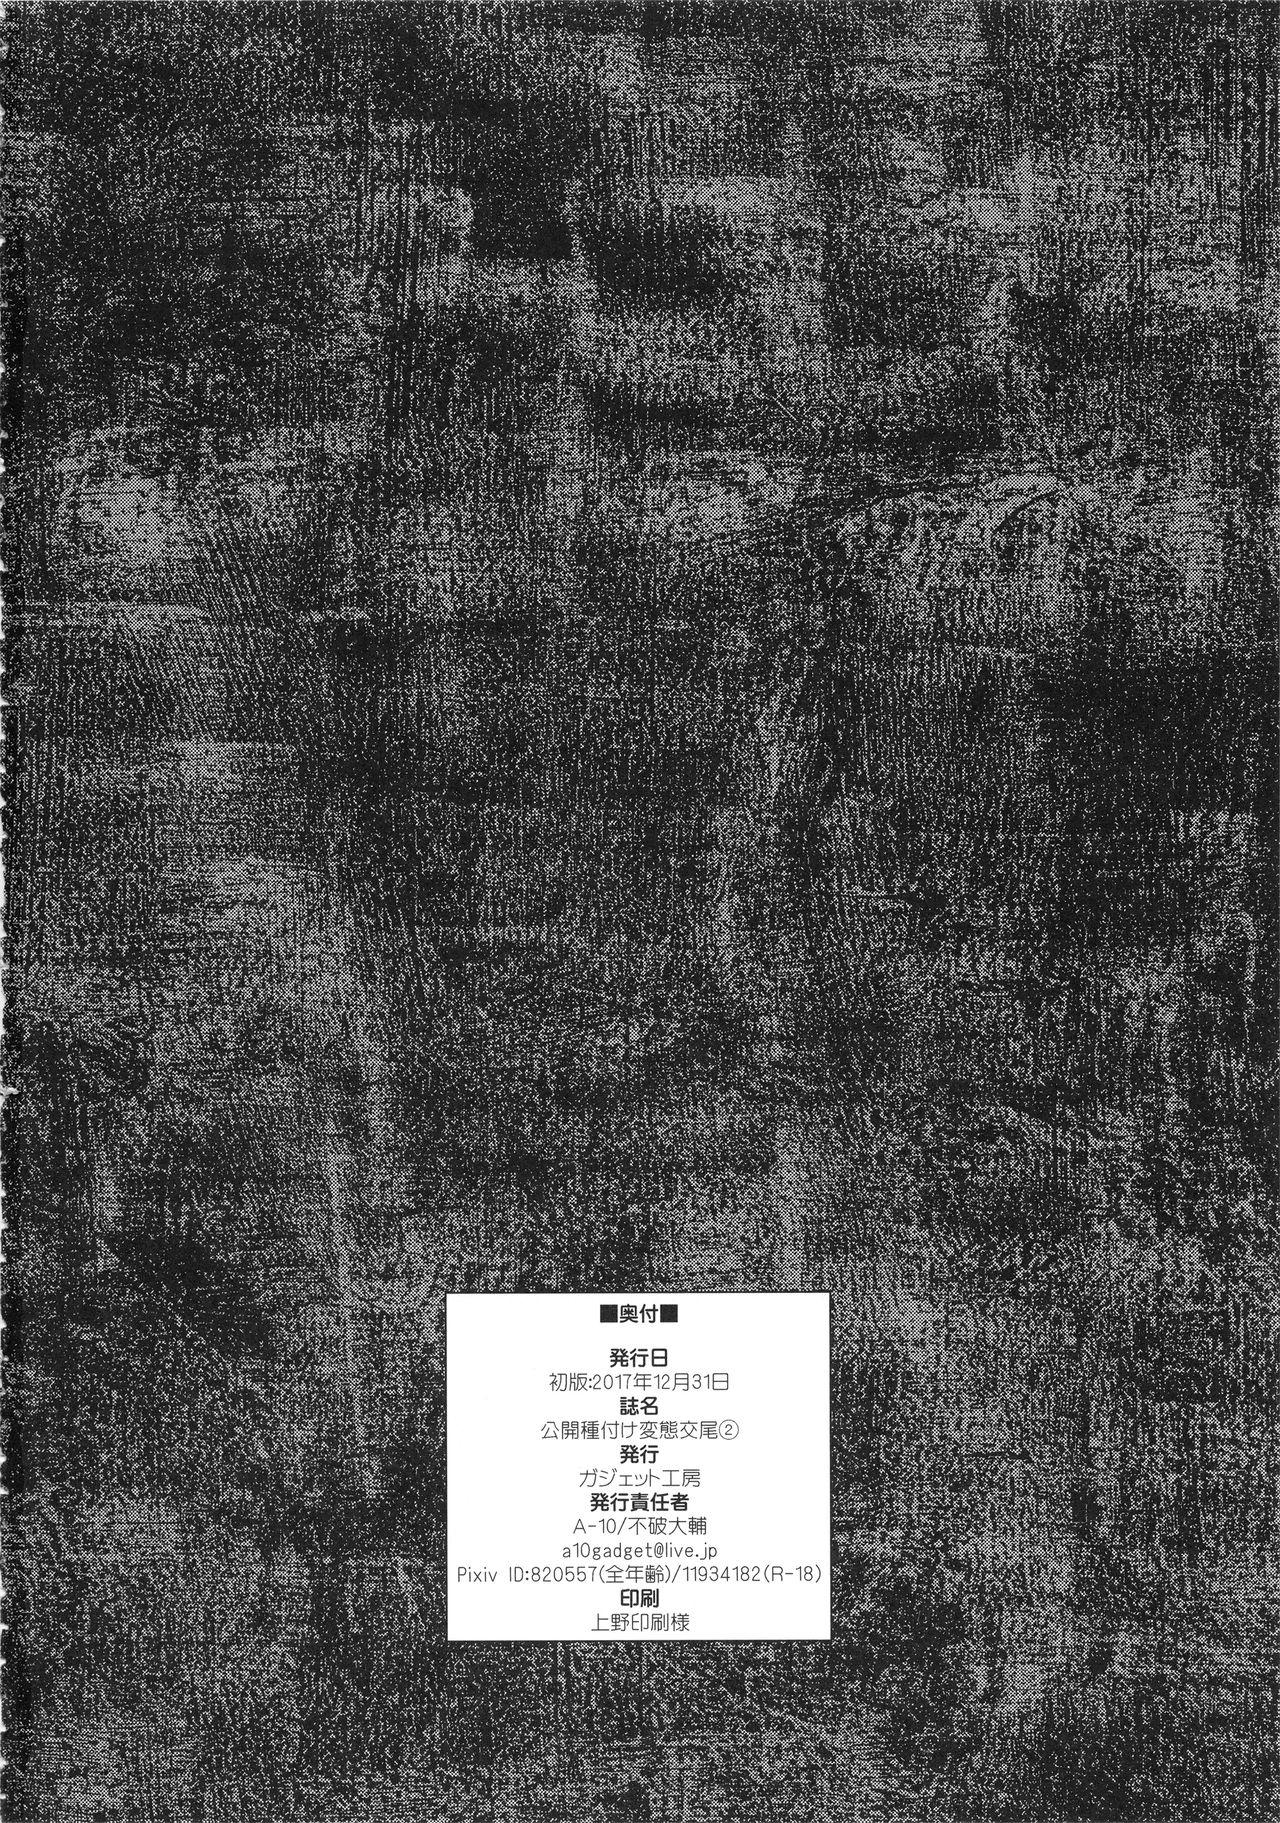 Koukai Tanetsuke Hentai Koubi 2 40